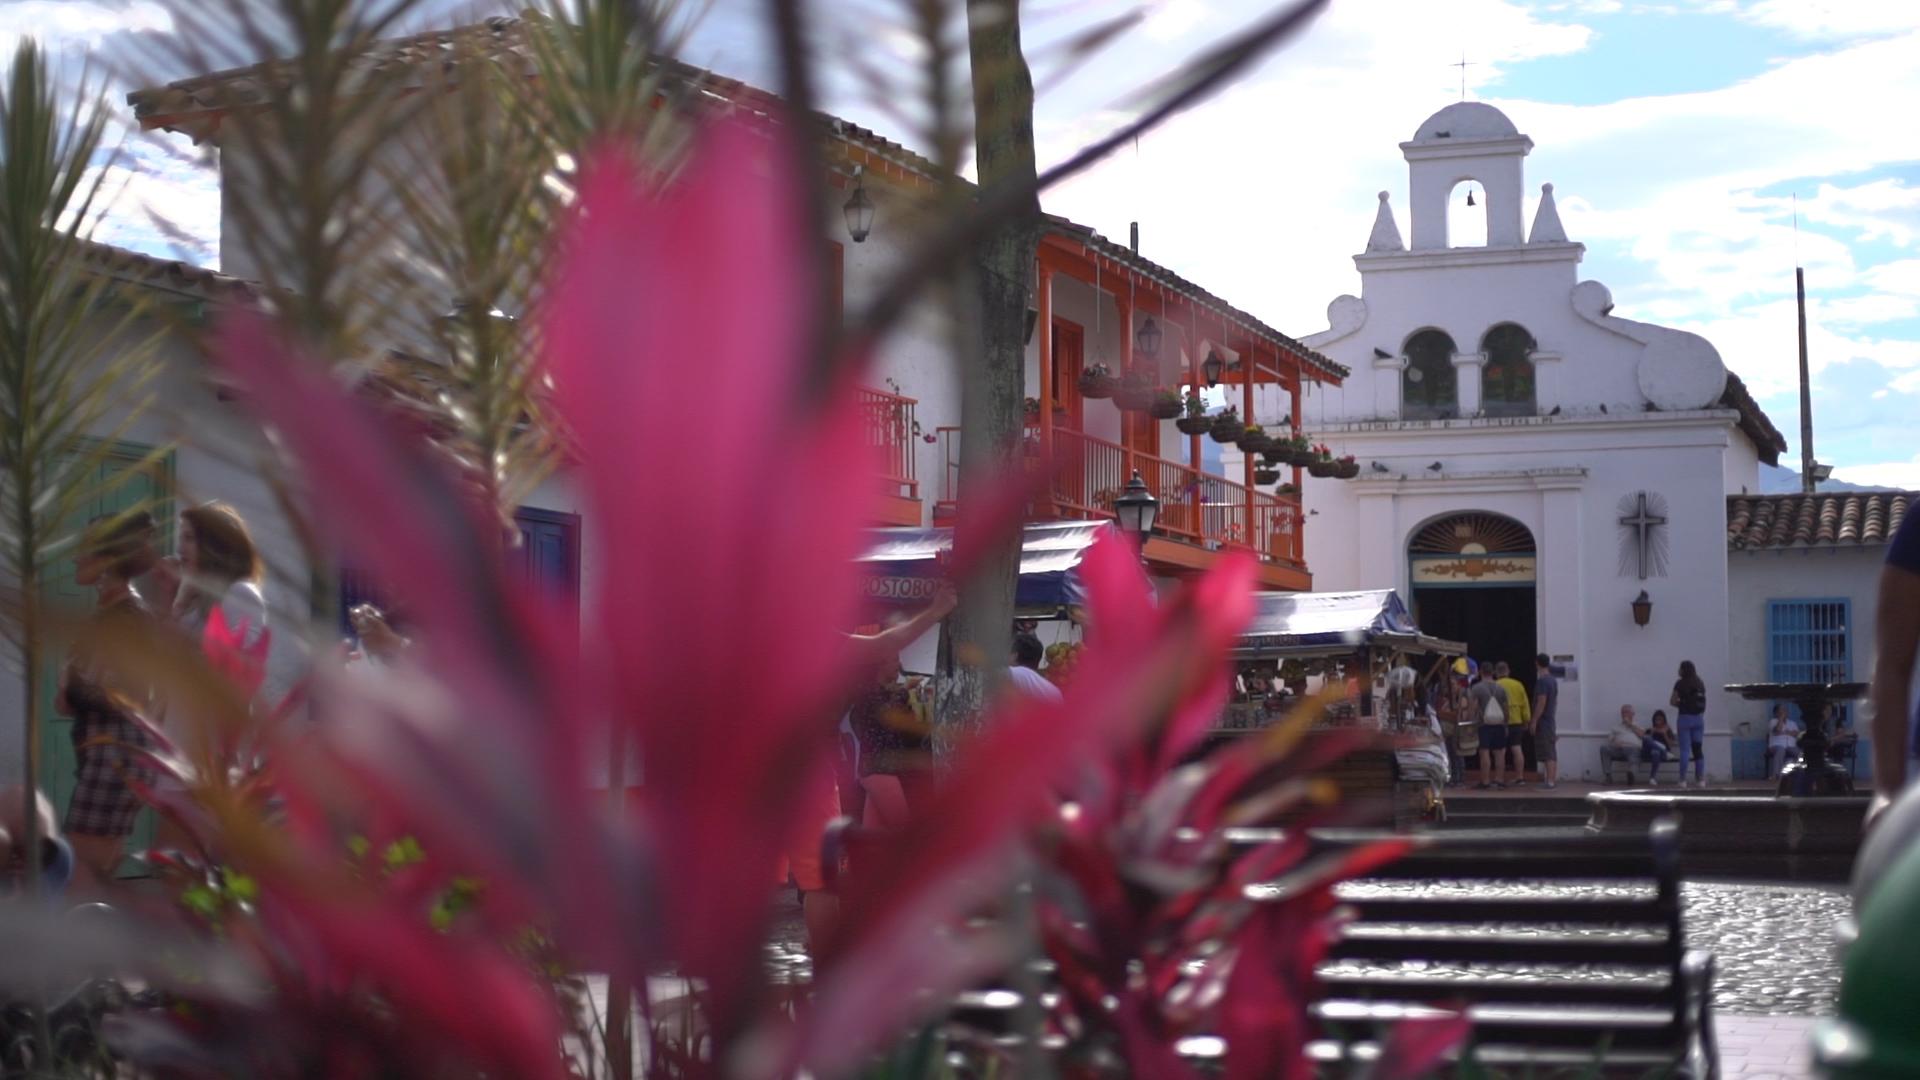 Monserrate in Bogota, a mix of magic and spirituality